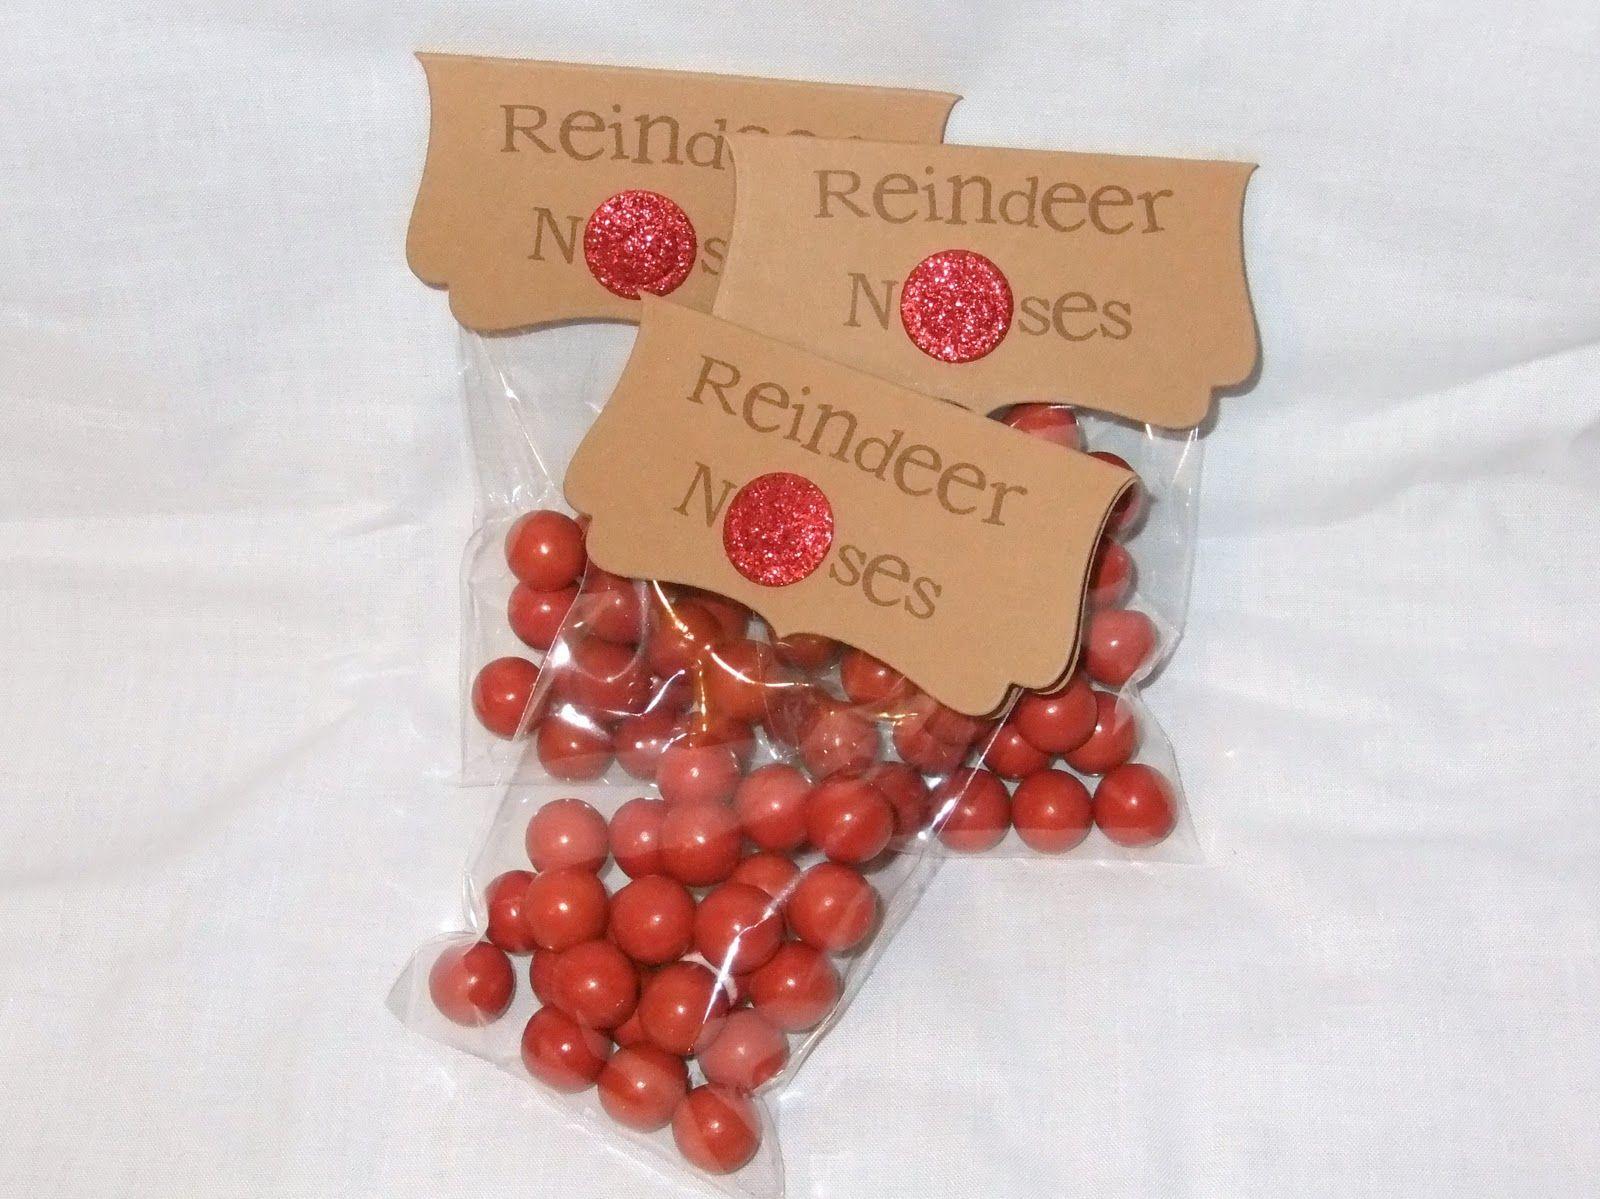 Christmas T Idea Reindeer Noses Sweetie Bags